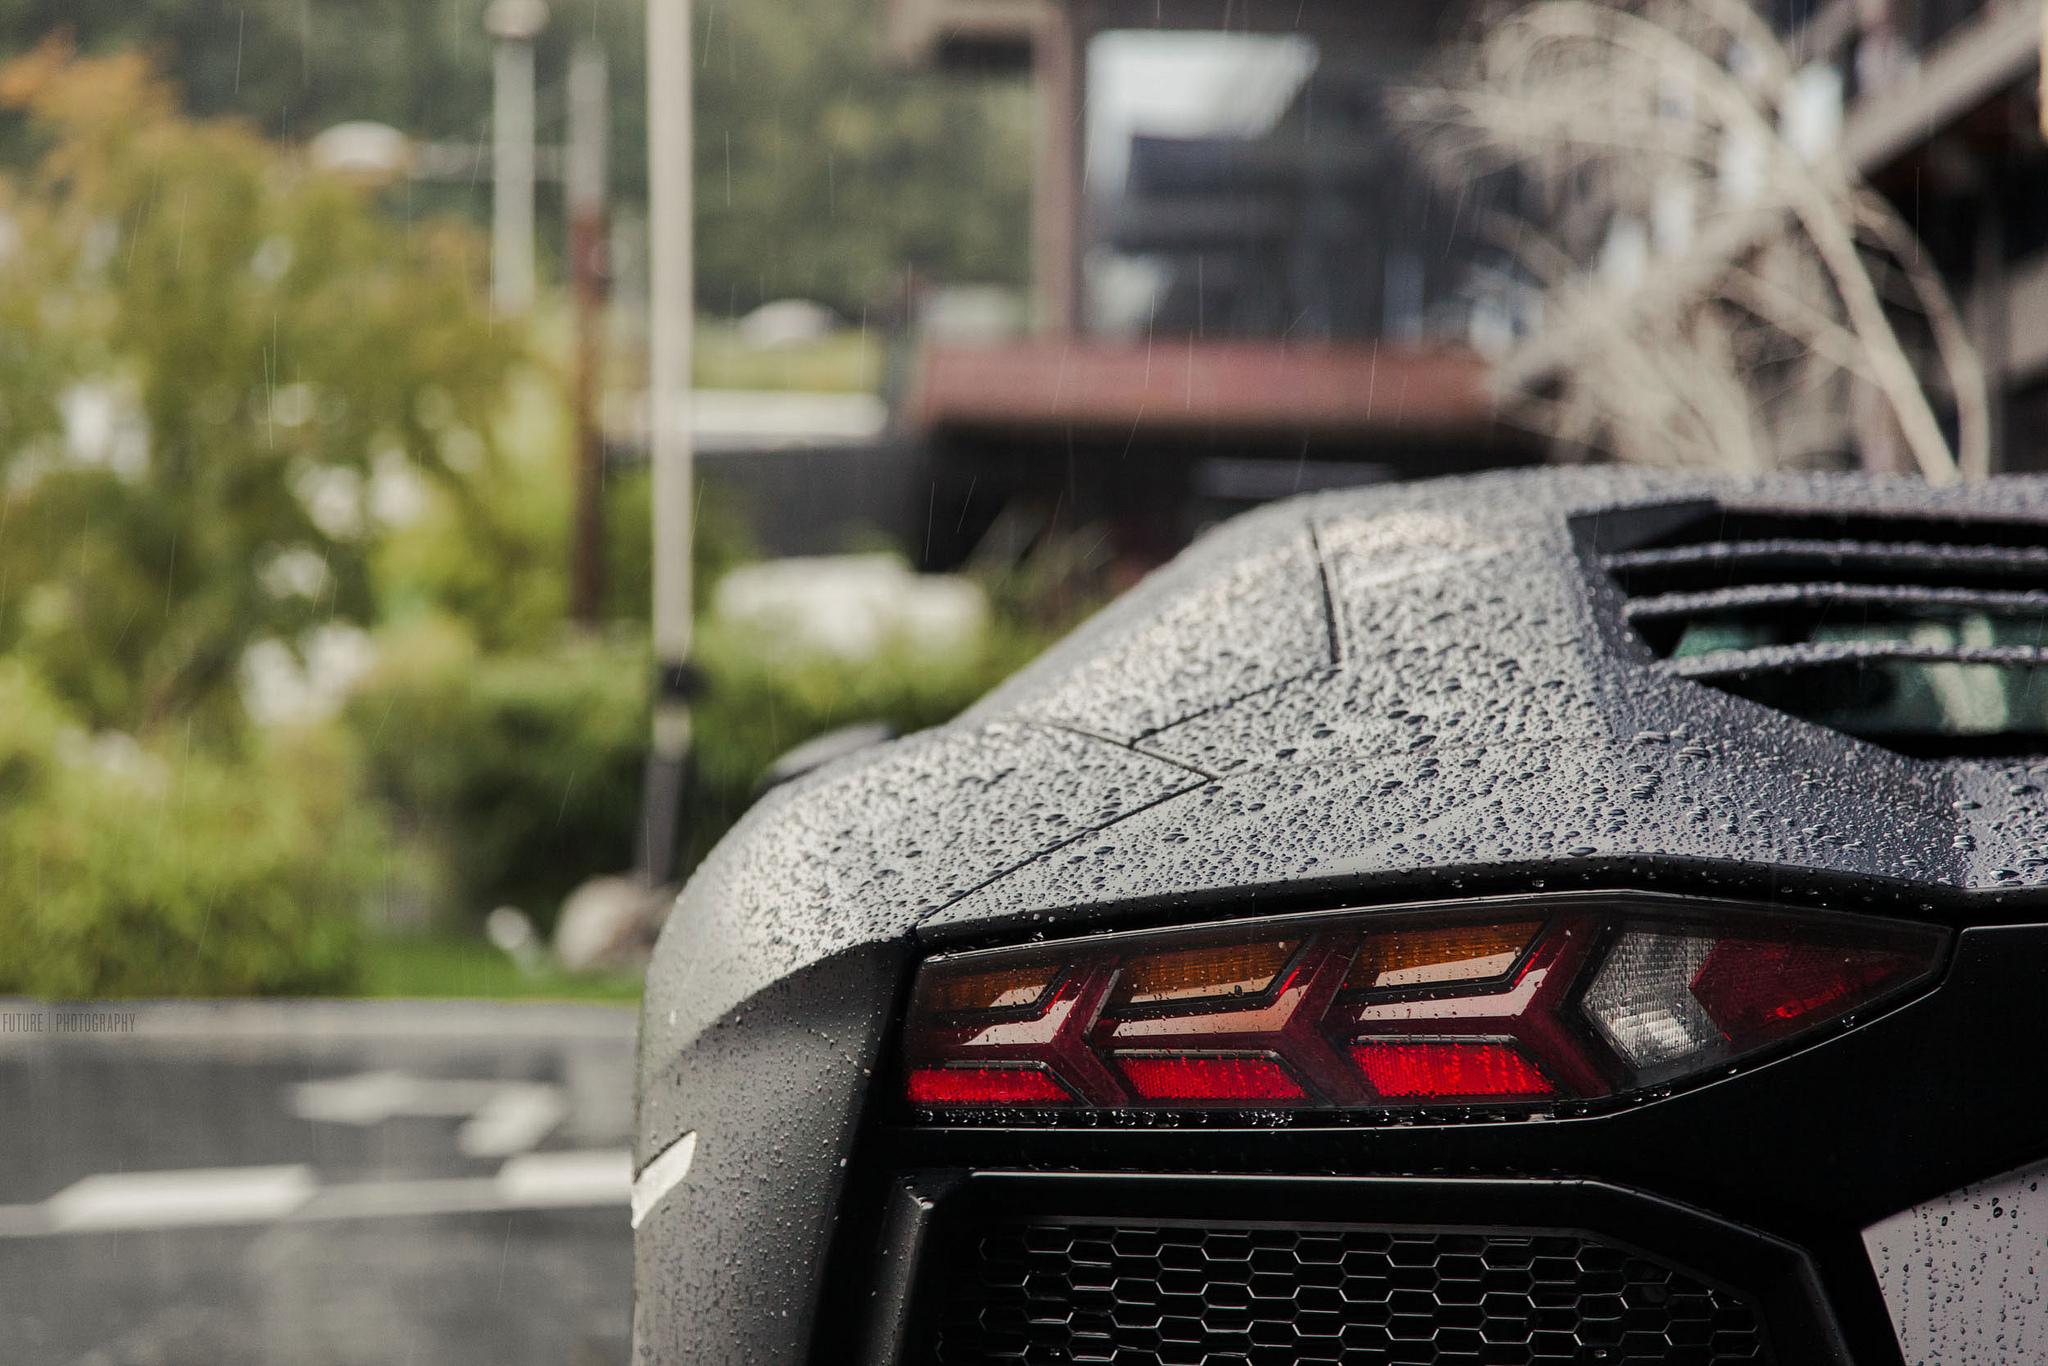 Gentil Car Vehicle Rain Lamborghini Lamborghini Aventador Black Cars Super Car  Sports Car Performance Car Wheel Supercar